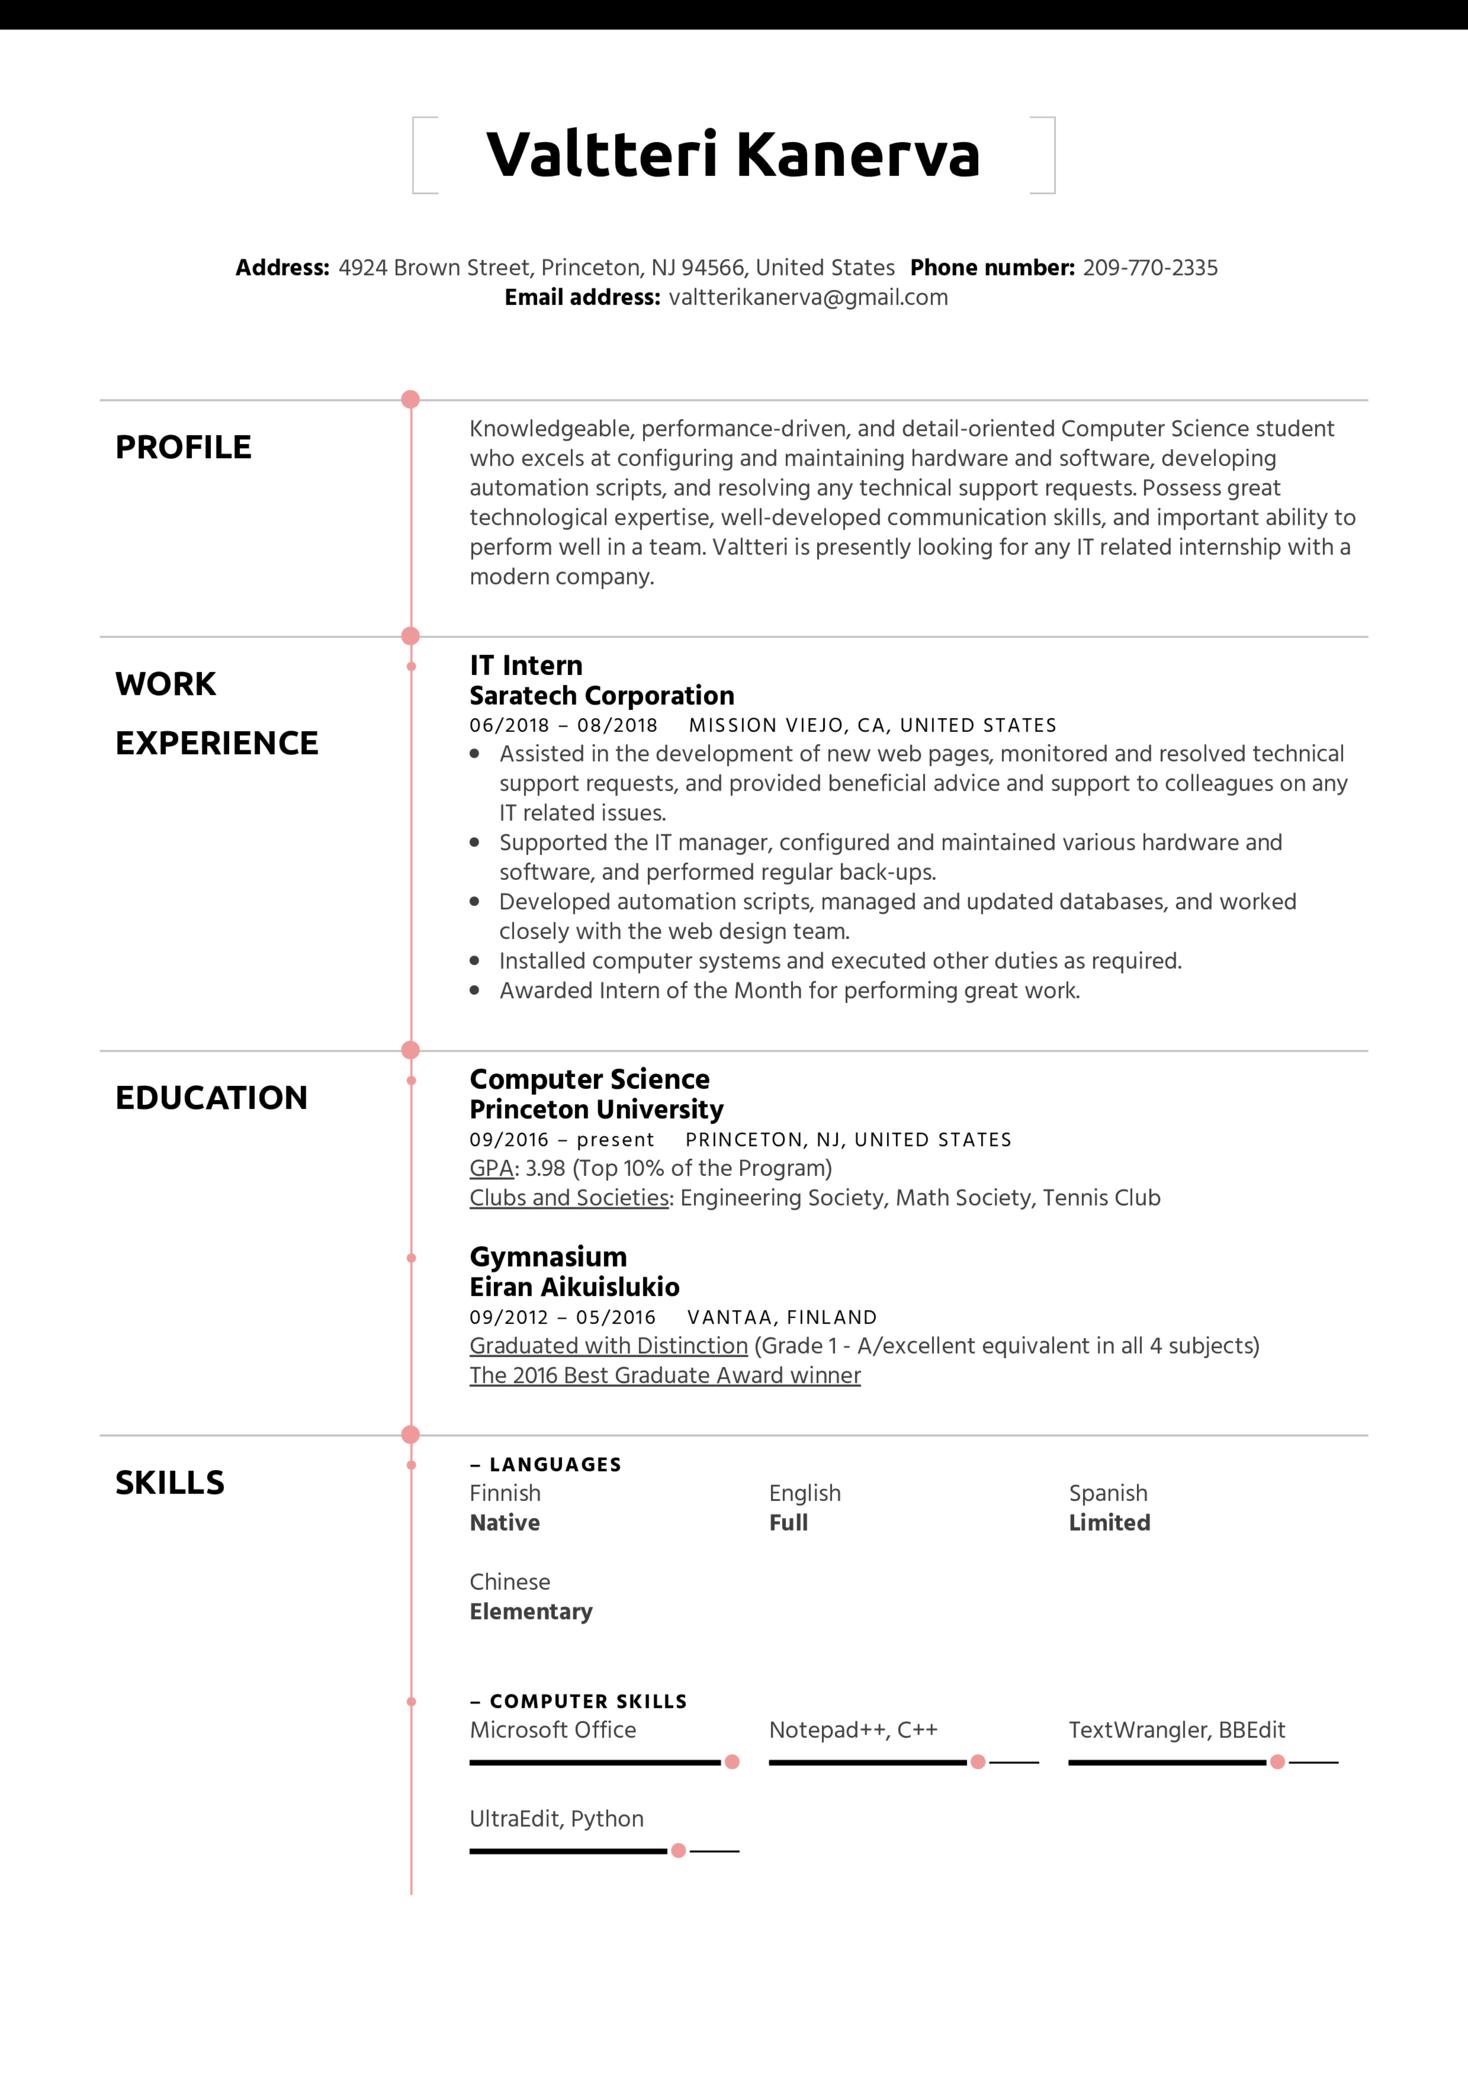 IT Intern Resume Template (Teil 1)